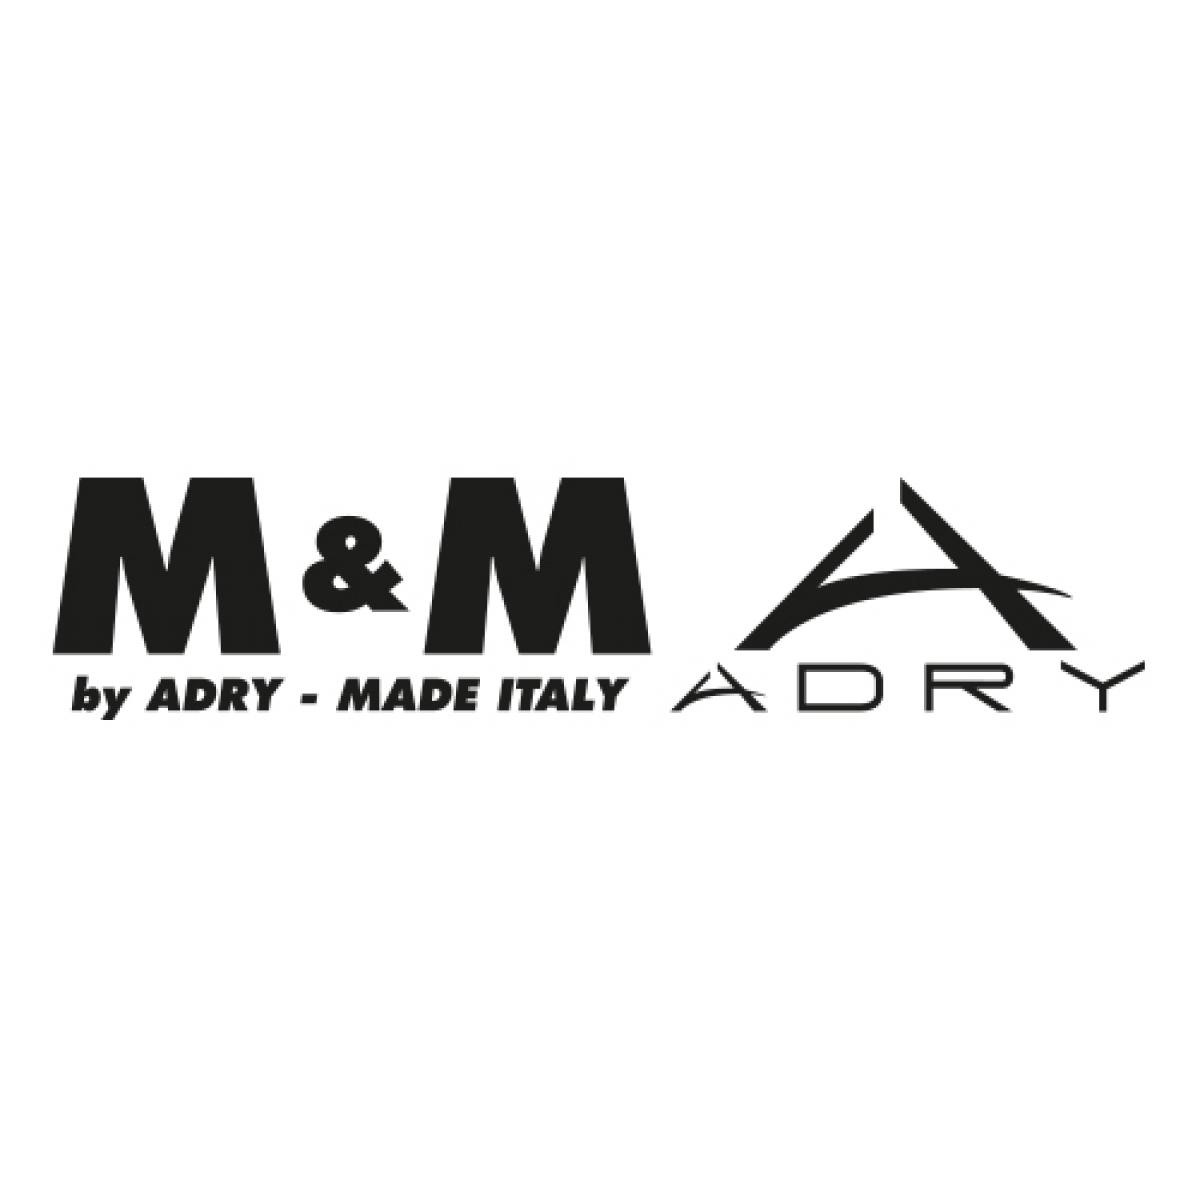 Moda Adry